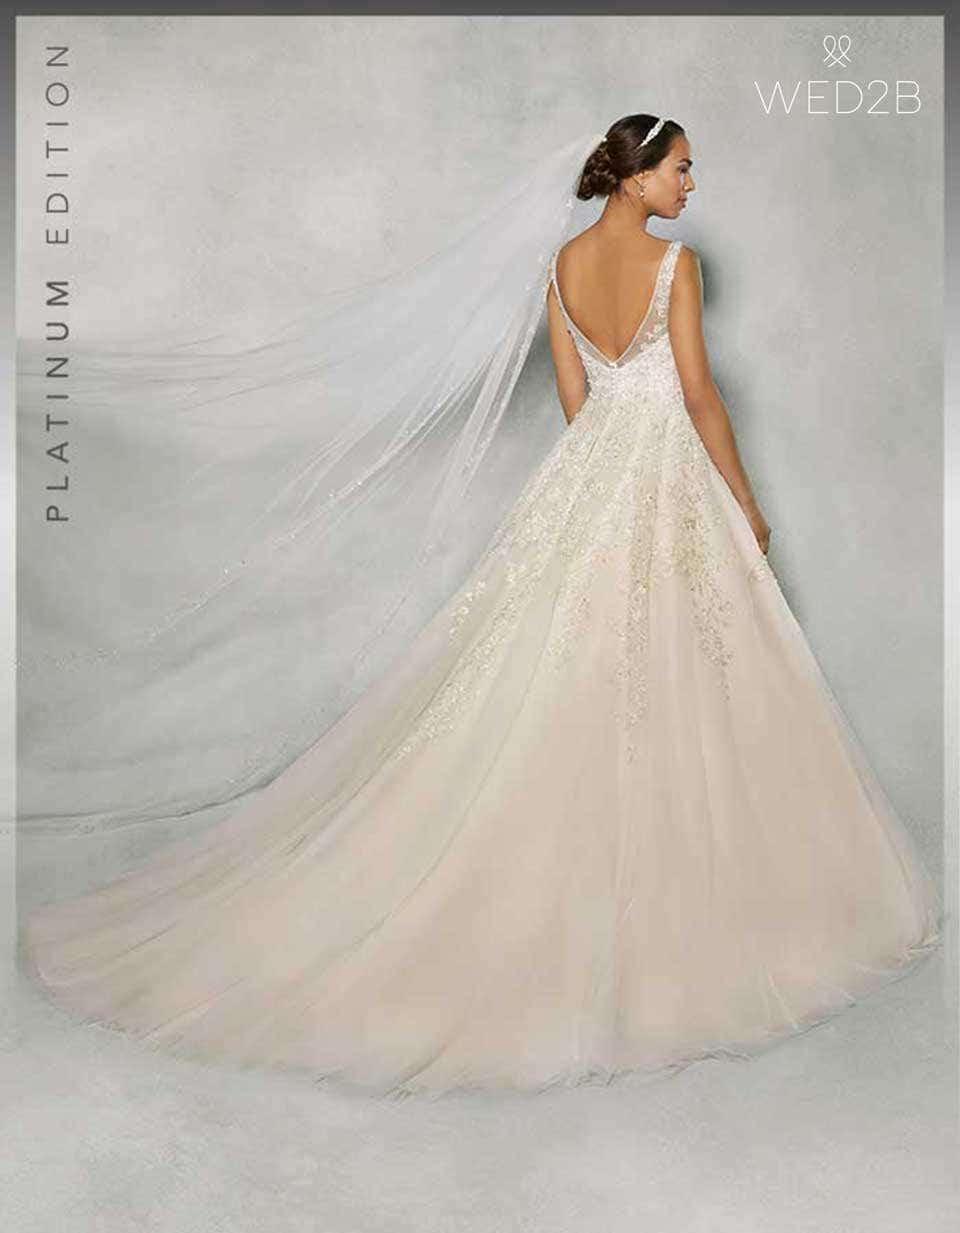 Dorian-Embroidered wedding dresses